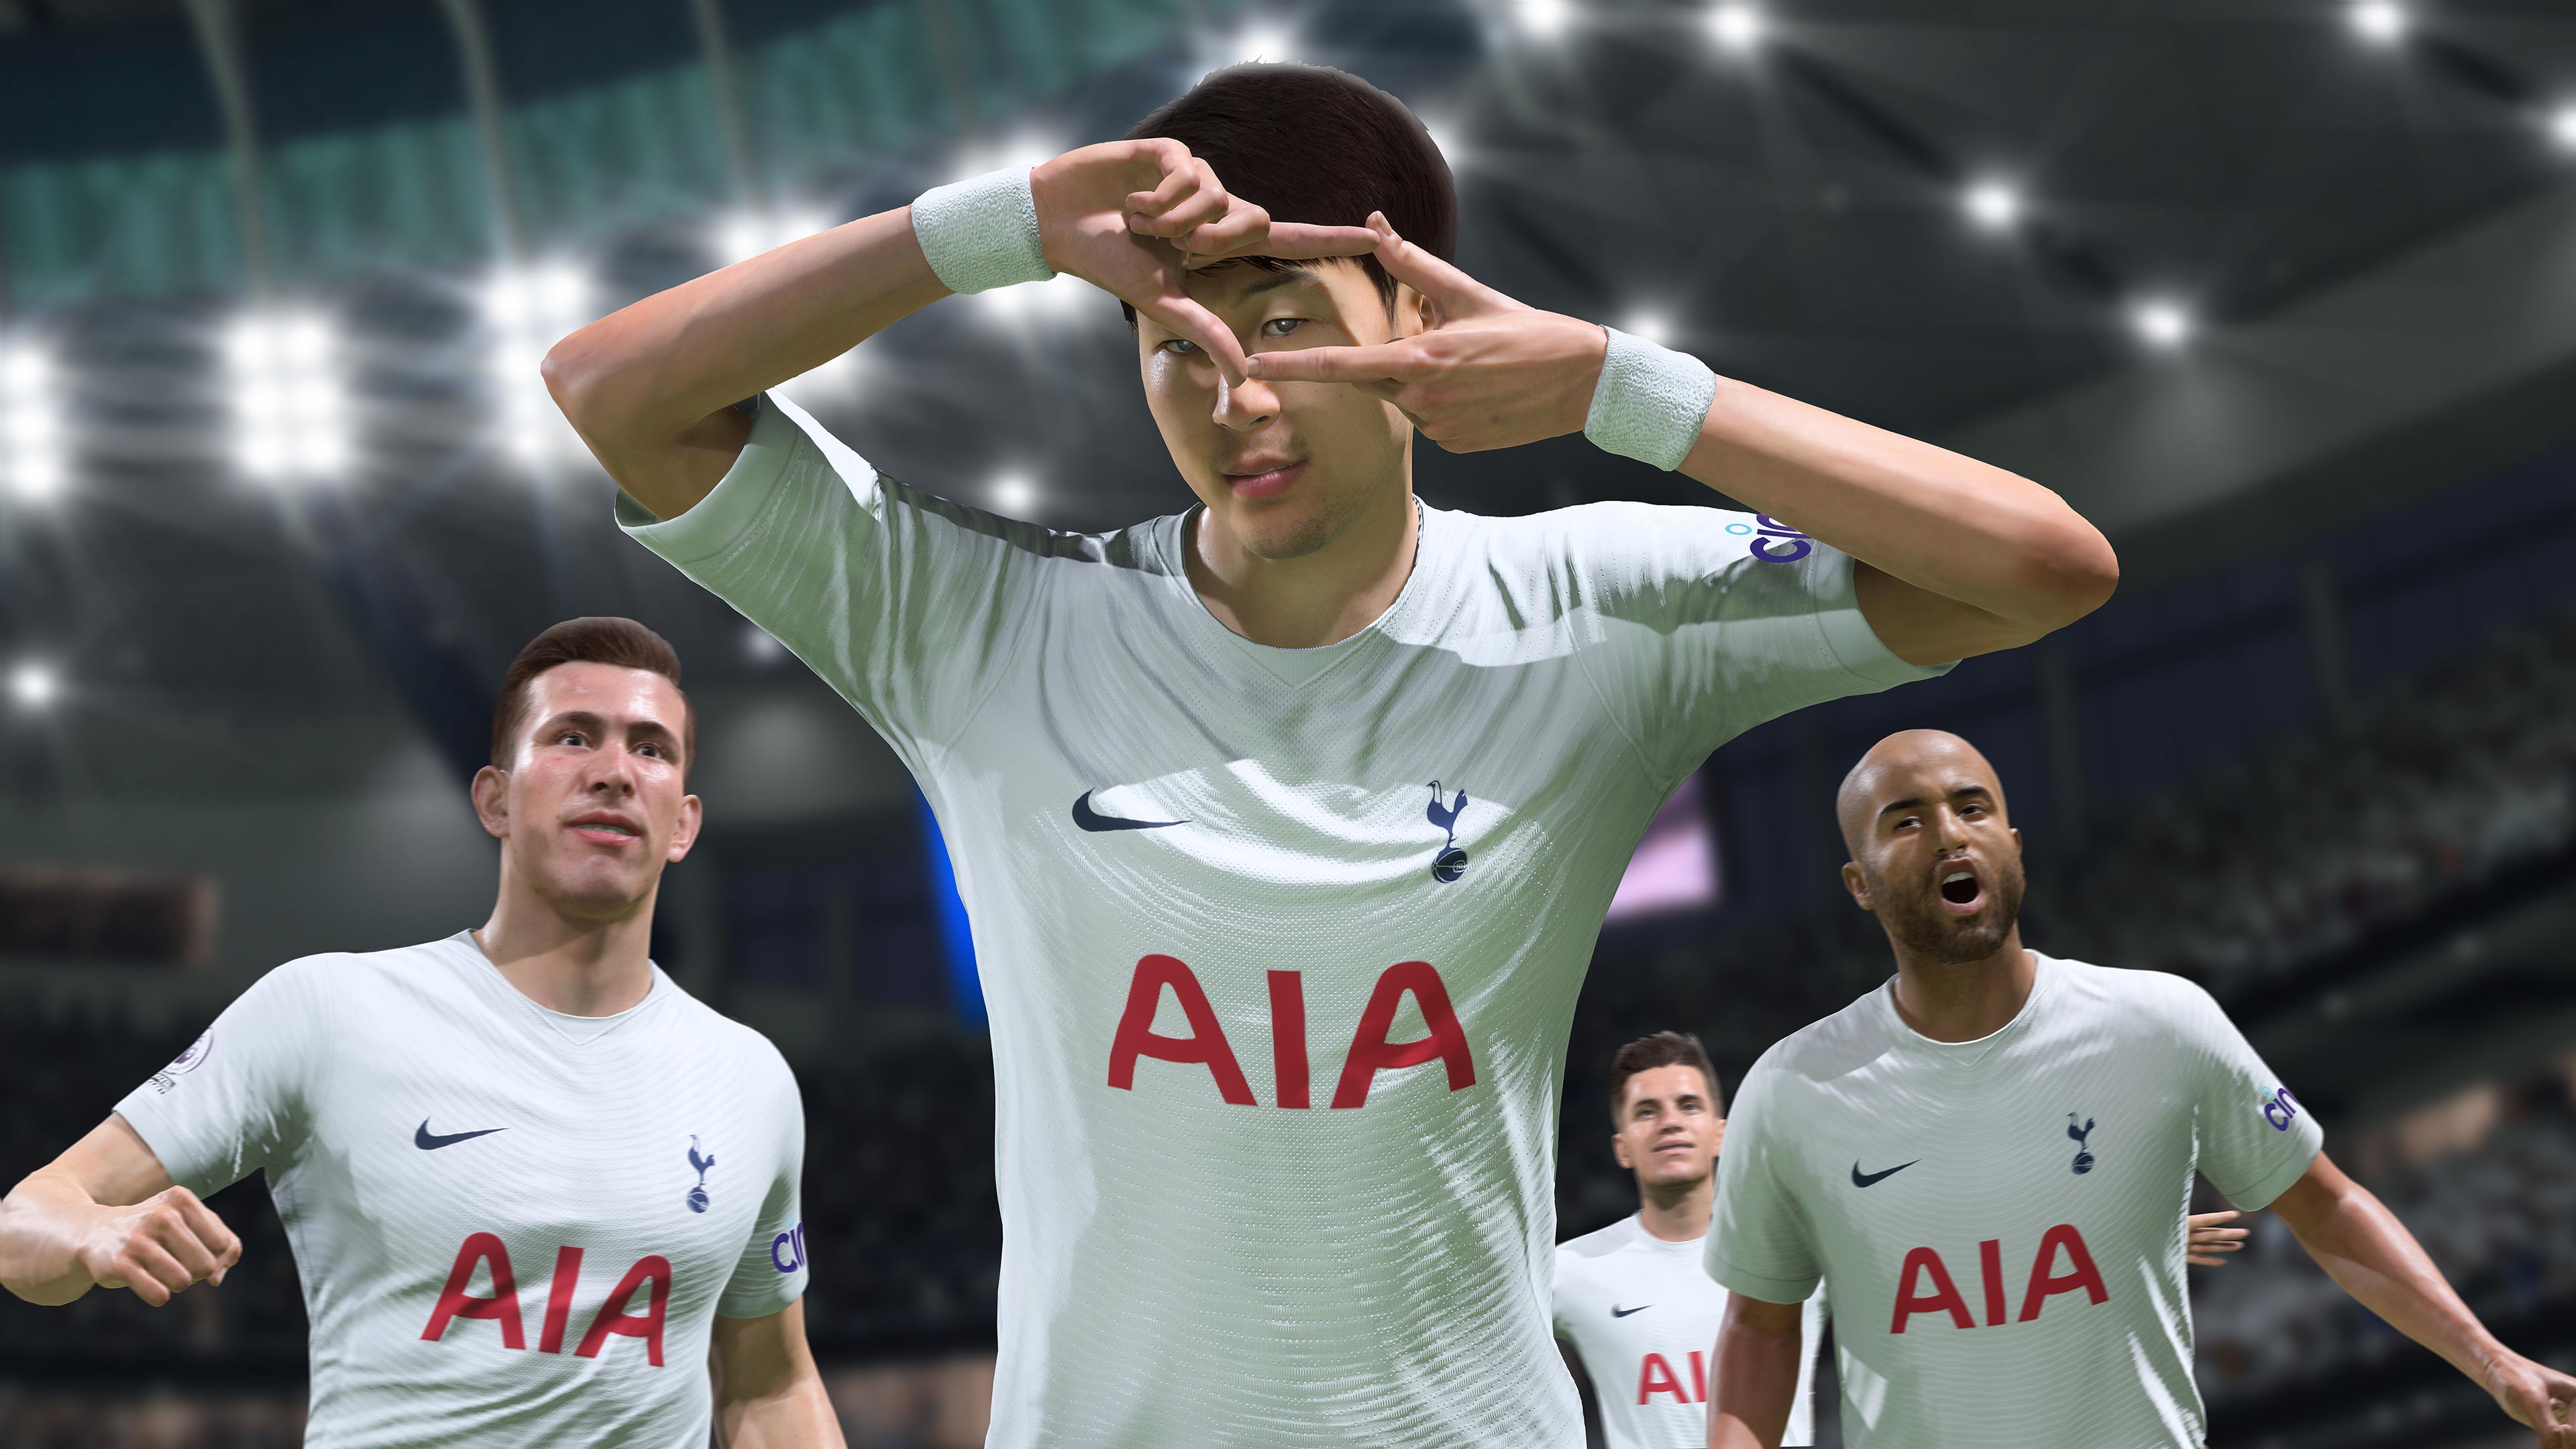 Скриншот №3 к FIFA 22 издание Ultimate PS4 и PS5